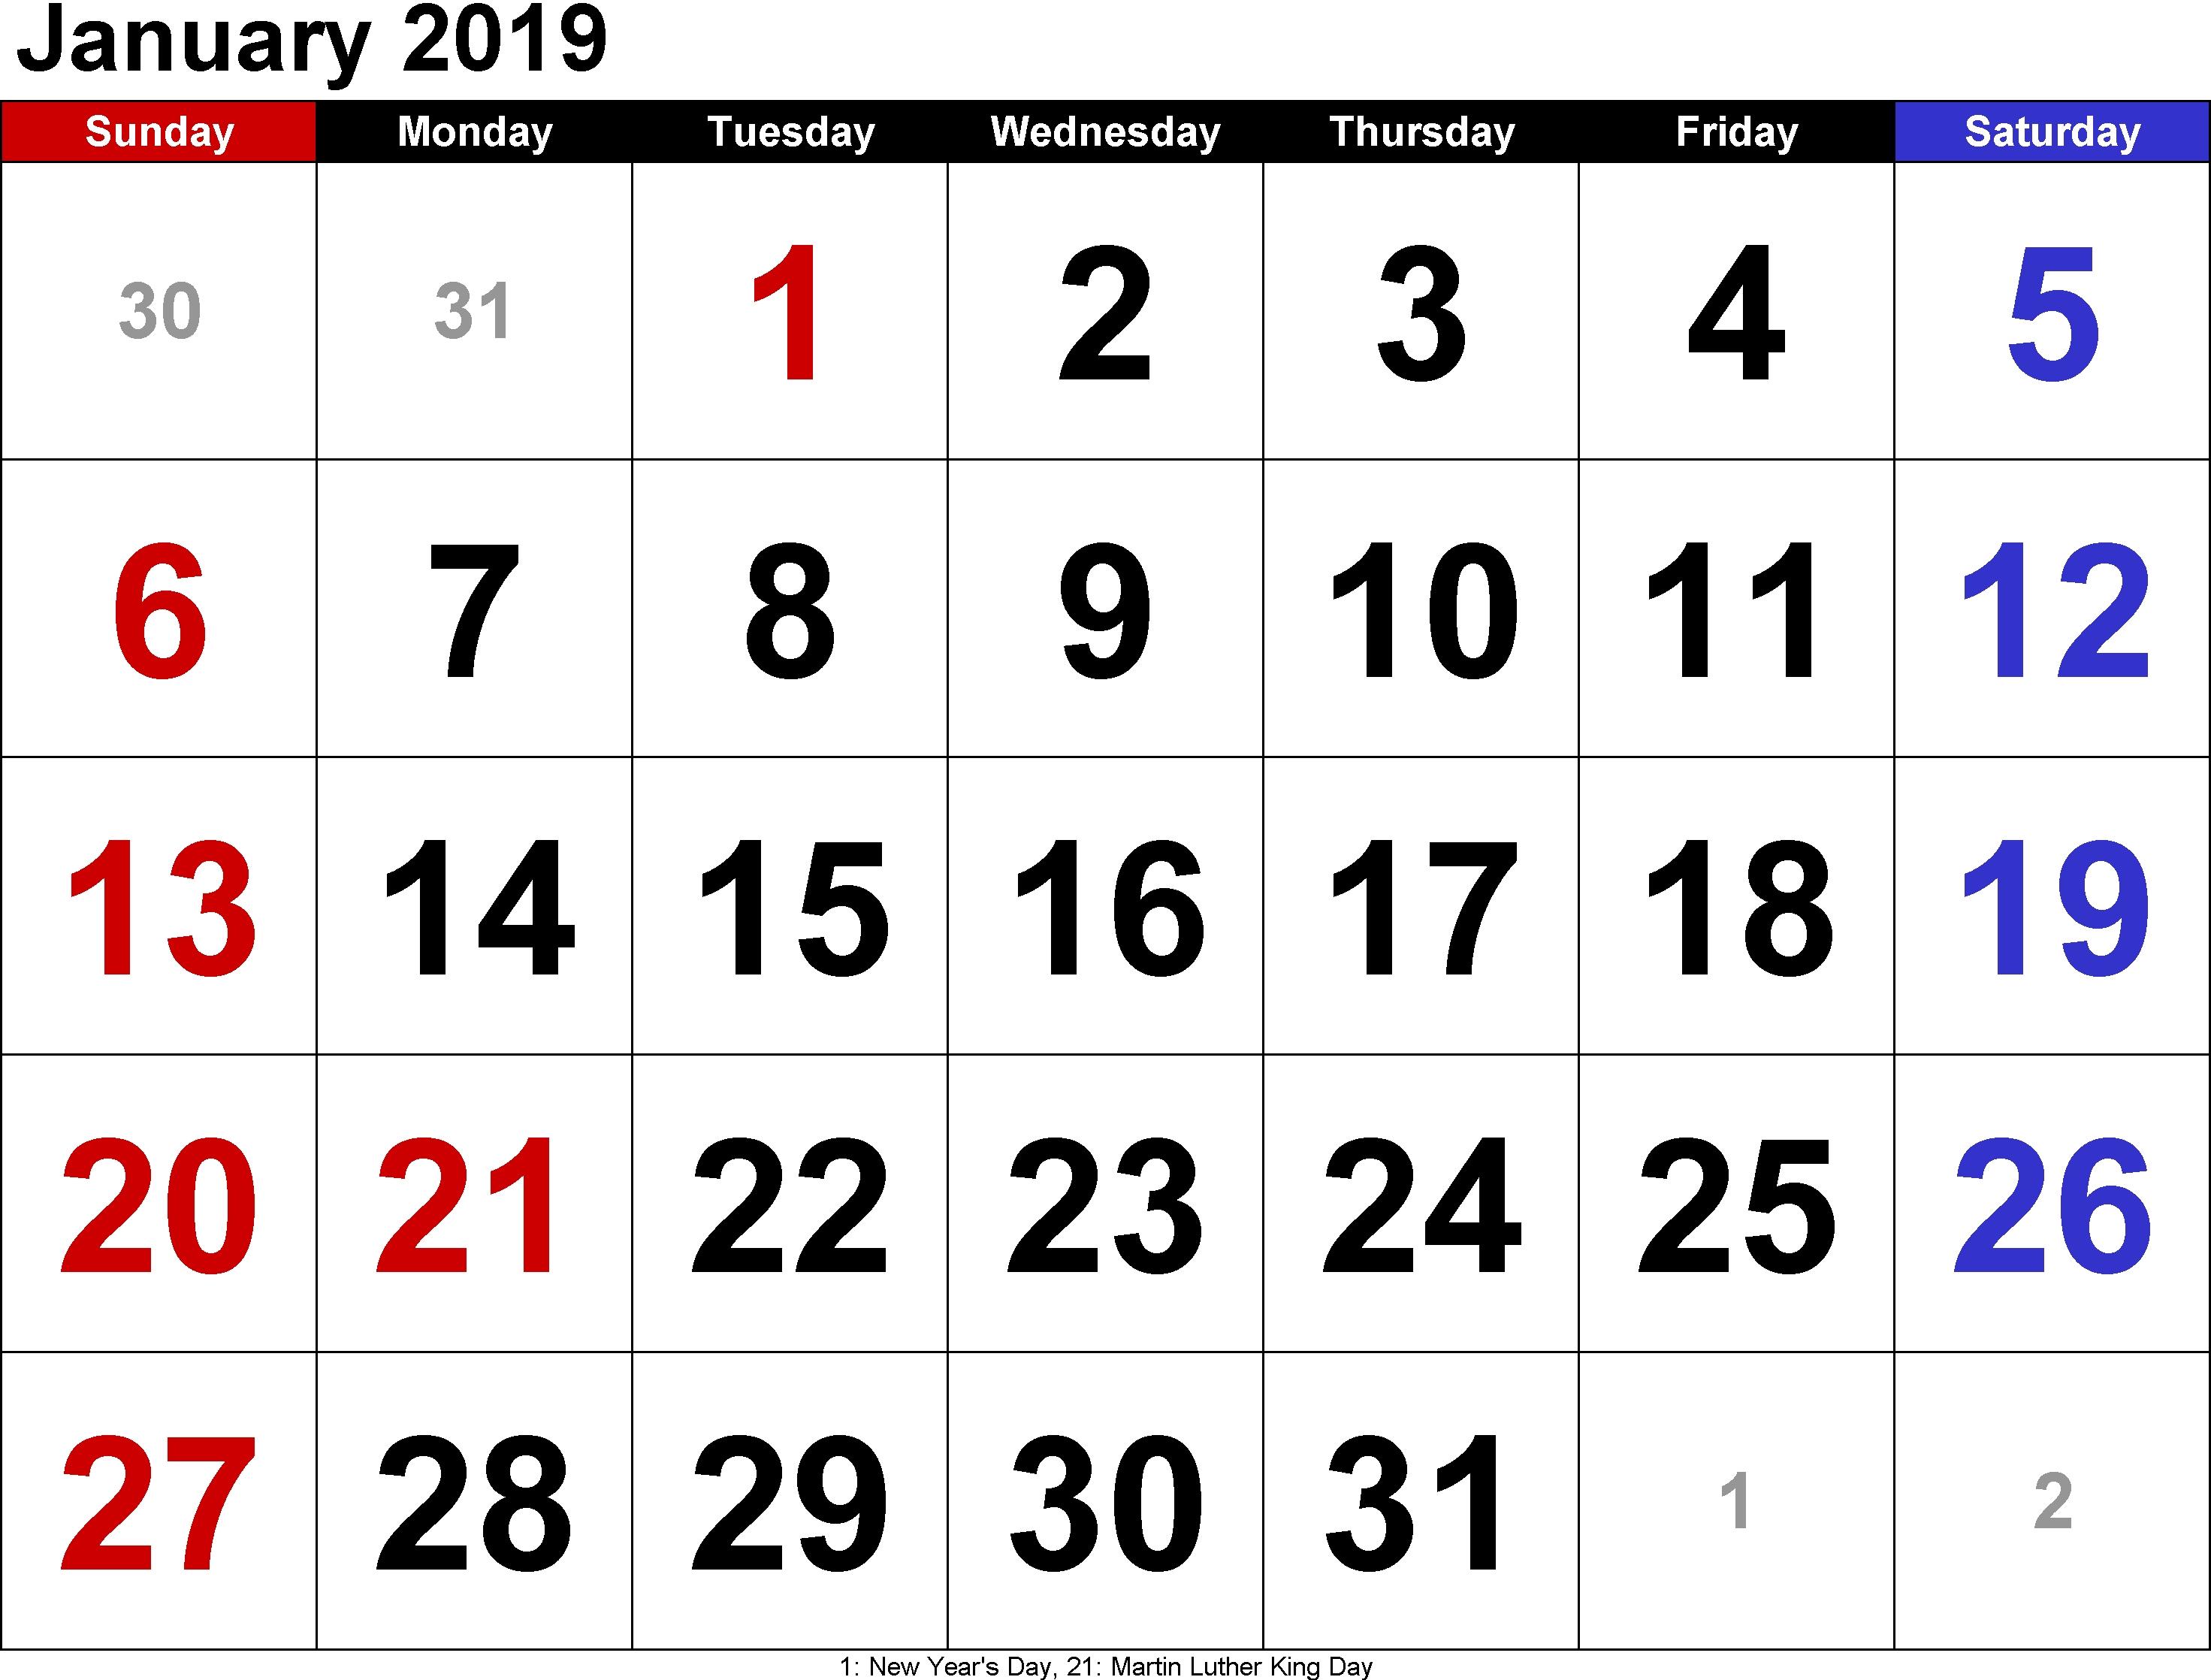 Free January Calendar 2019 | January 2019 Calendar | Pinterest January 7 2019 Calendar